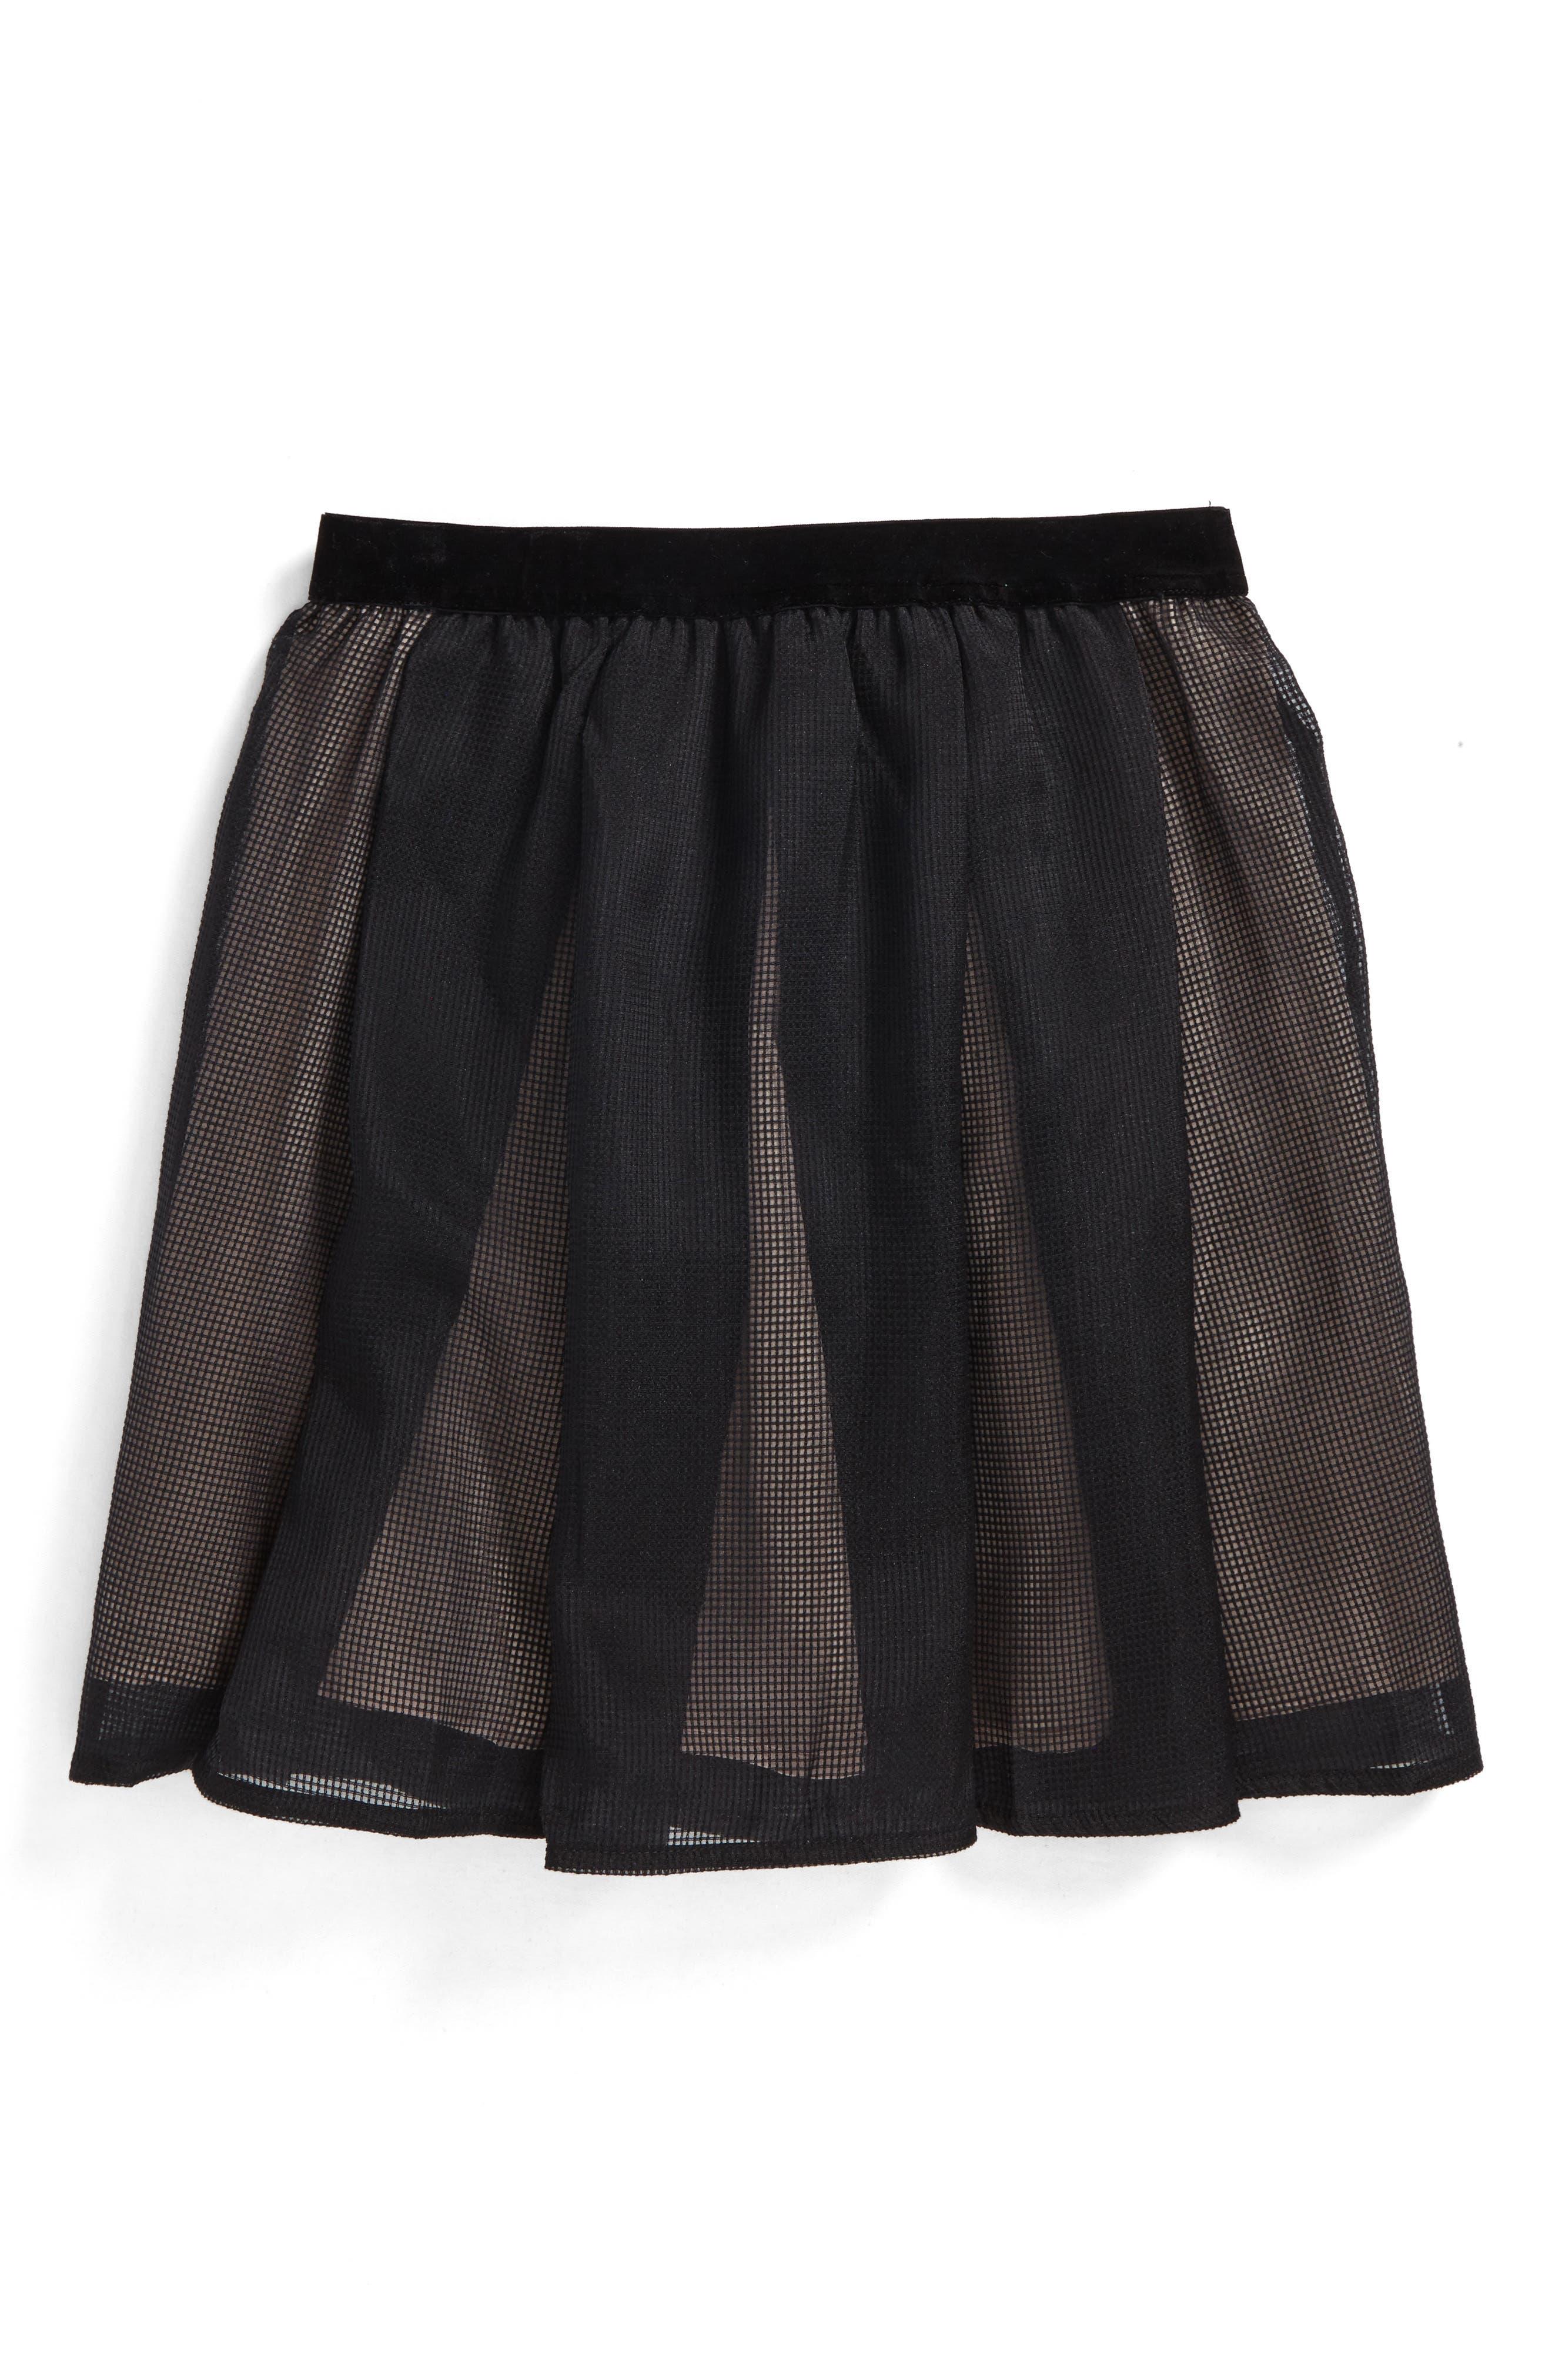 Blaire Mesh Skirt,                             Main thumbnail 1, color,                             001